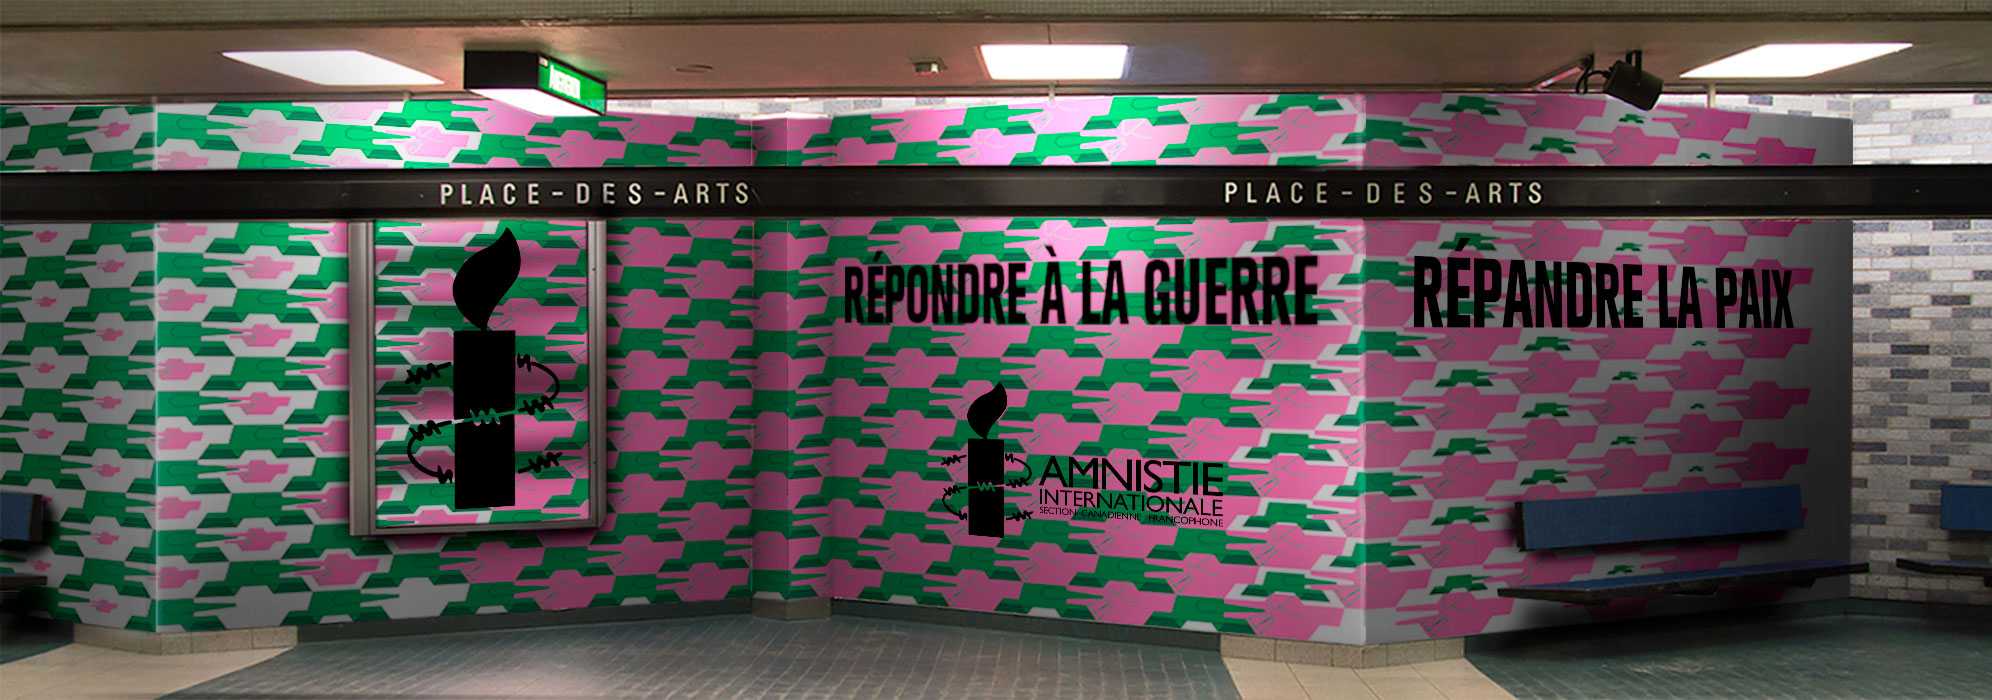 place-des-arts_mockup